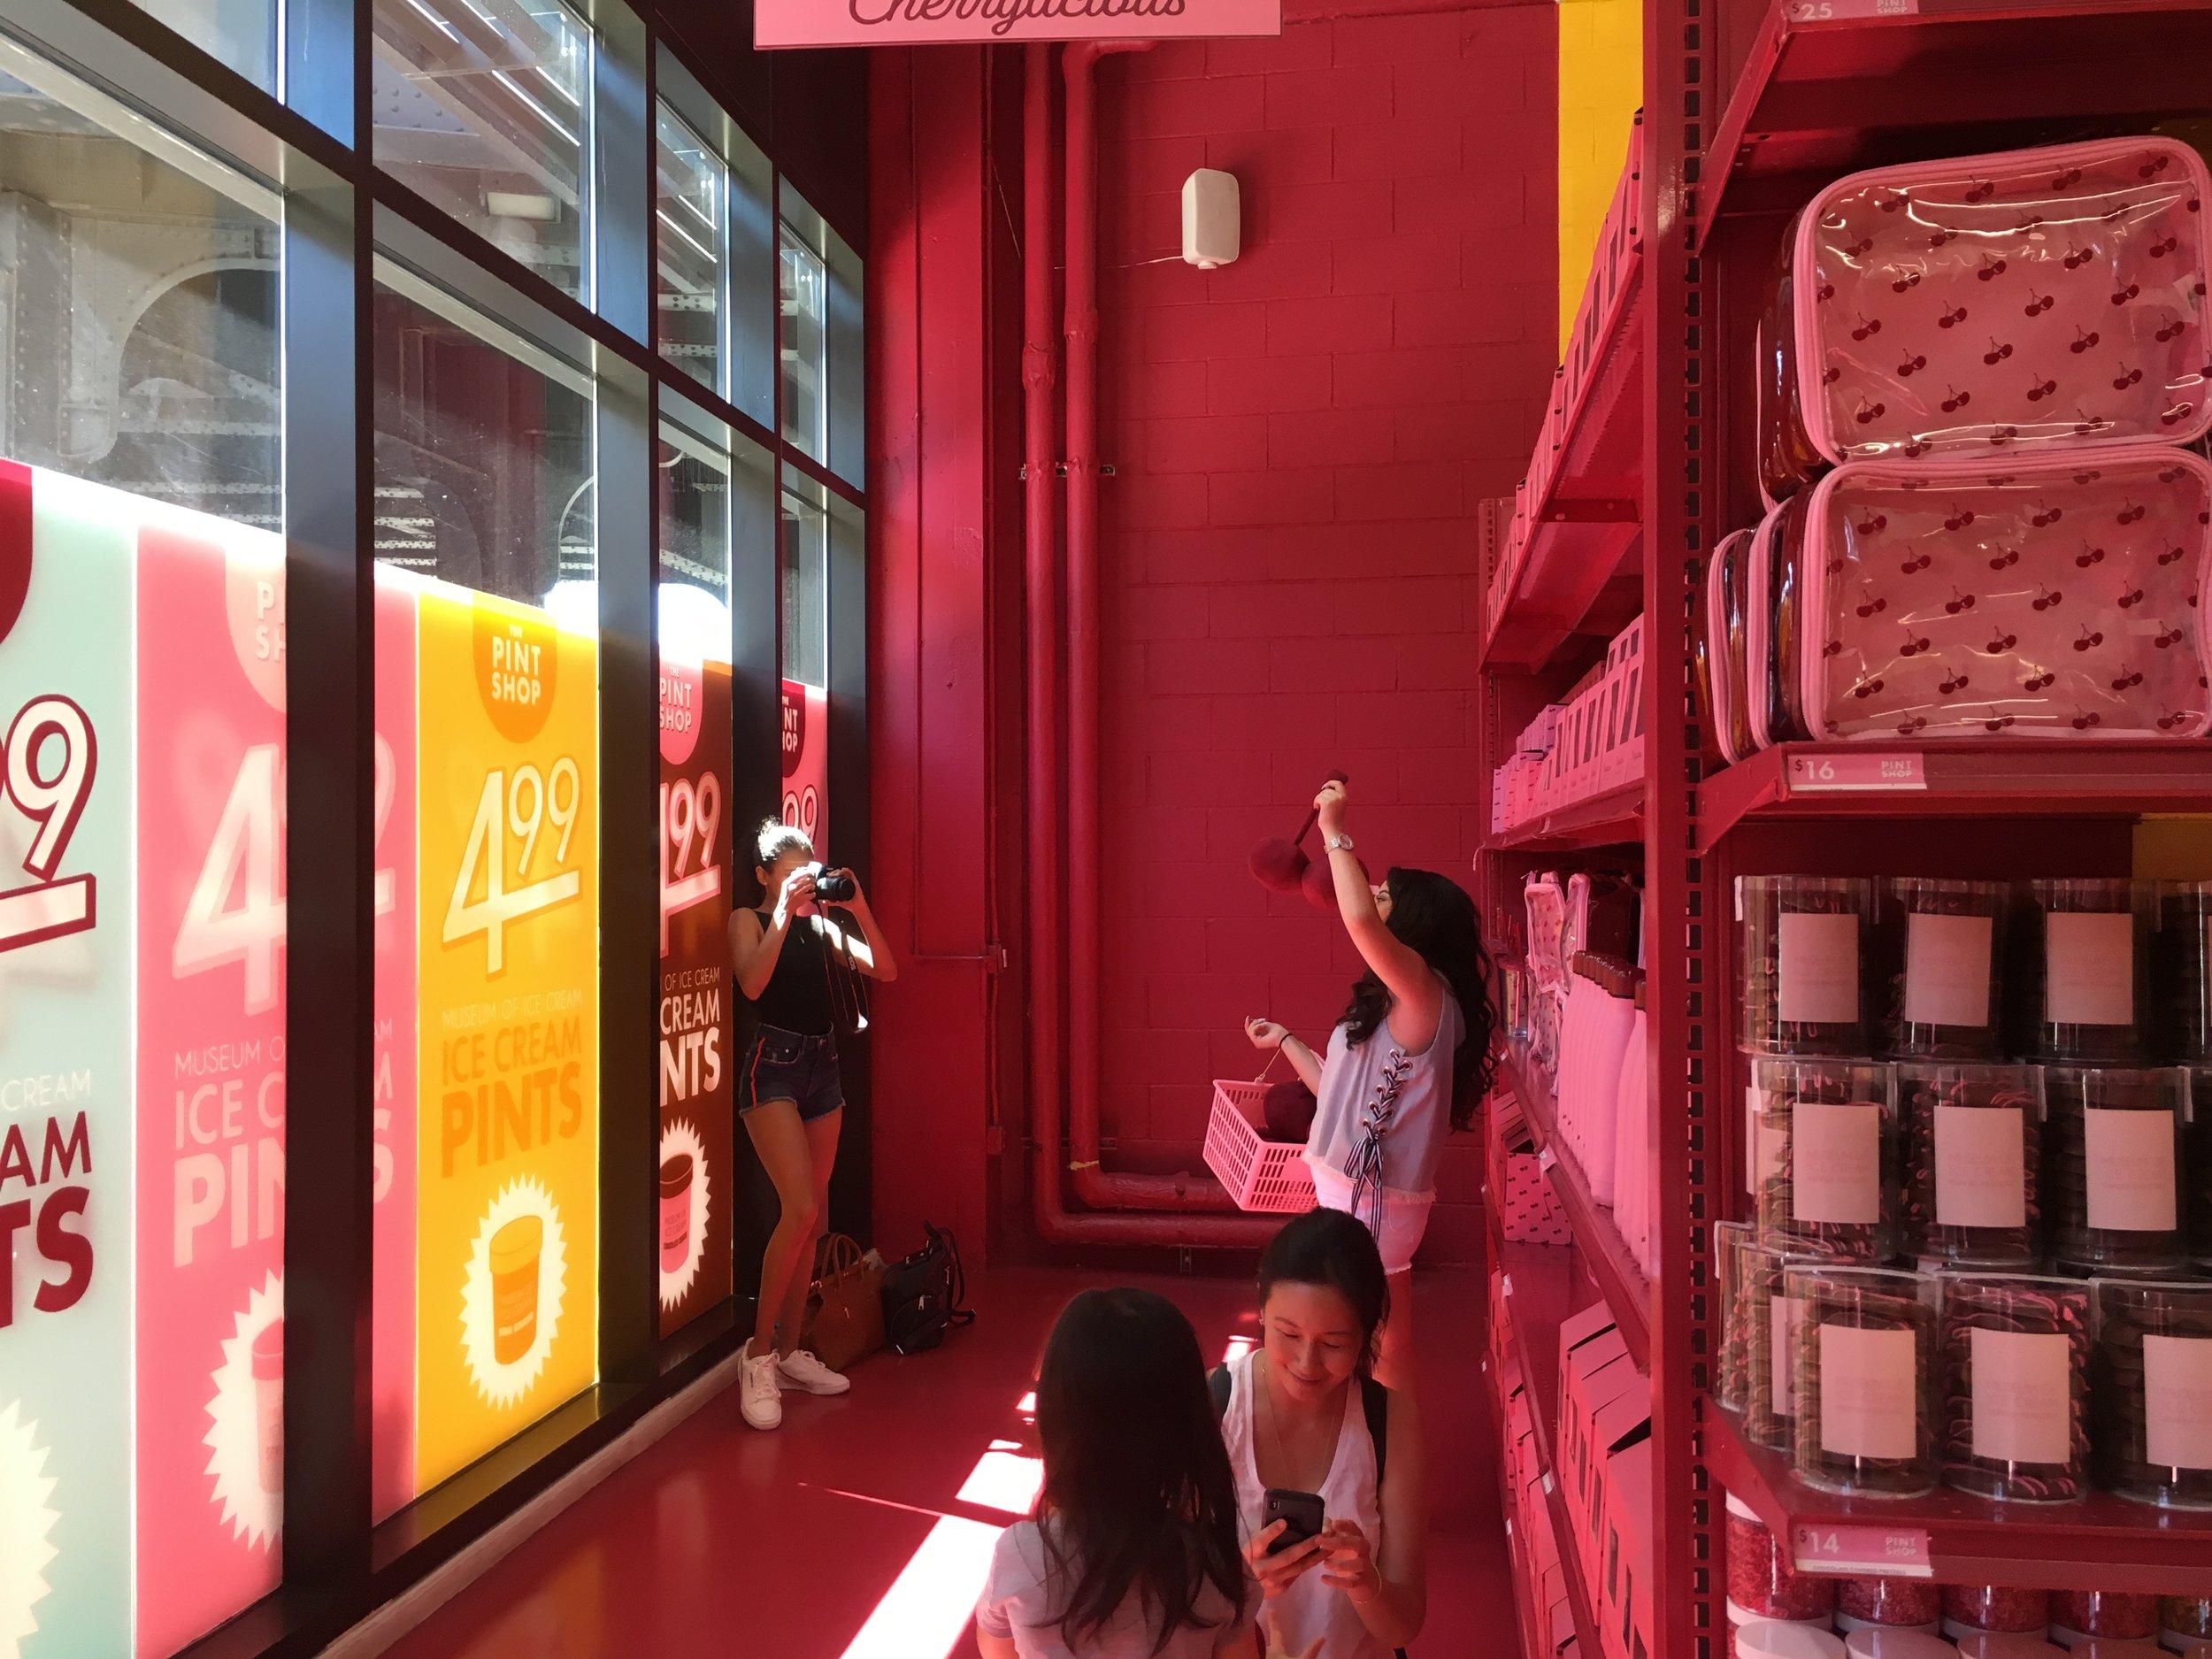 Museum of Ice Cream Activation